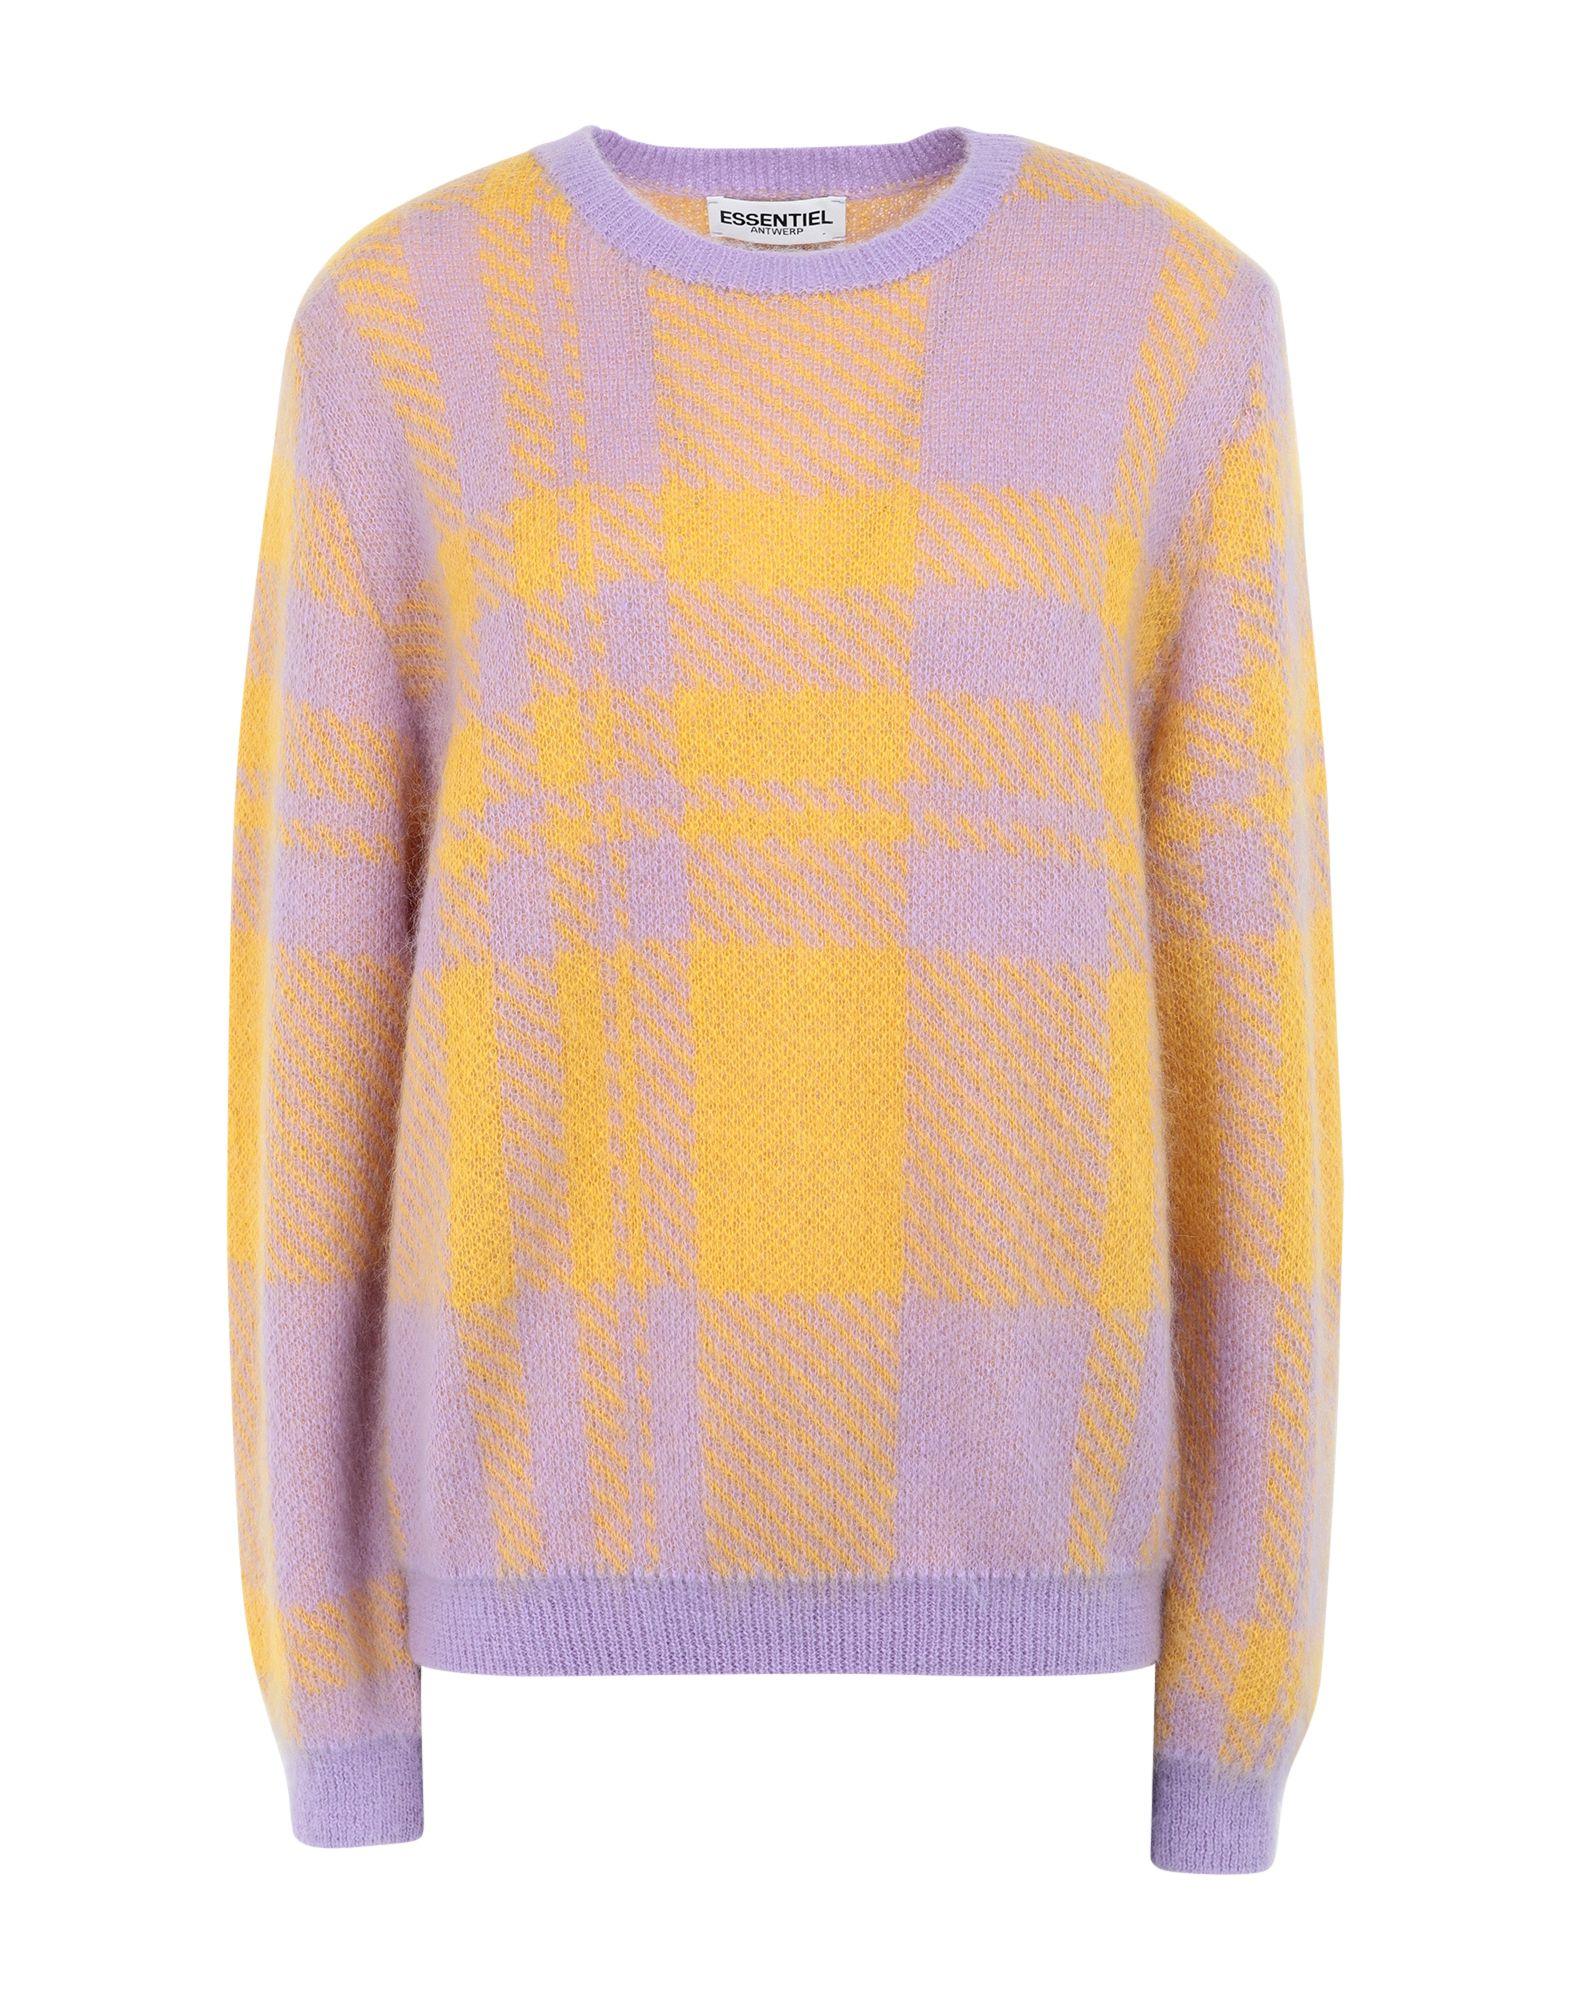 Pul r Essentiel Antwerp Timberlake Jacquard Sweater - donna donna donna - 39993229NP b56